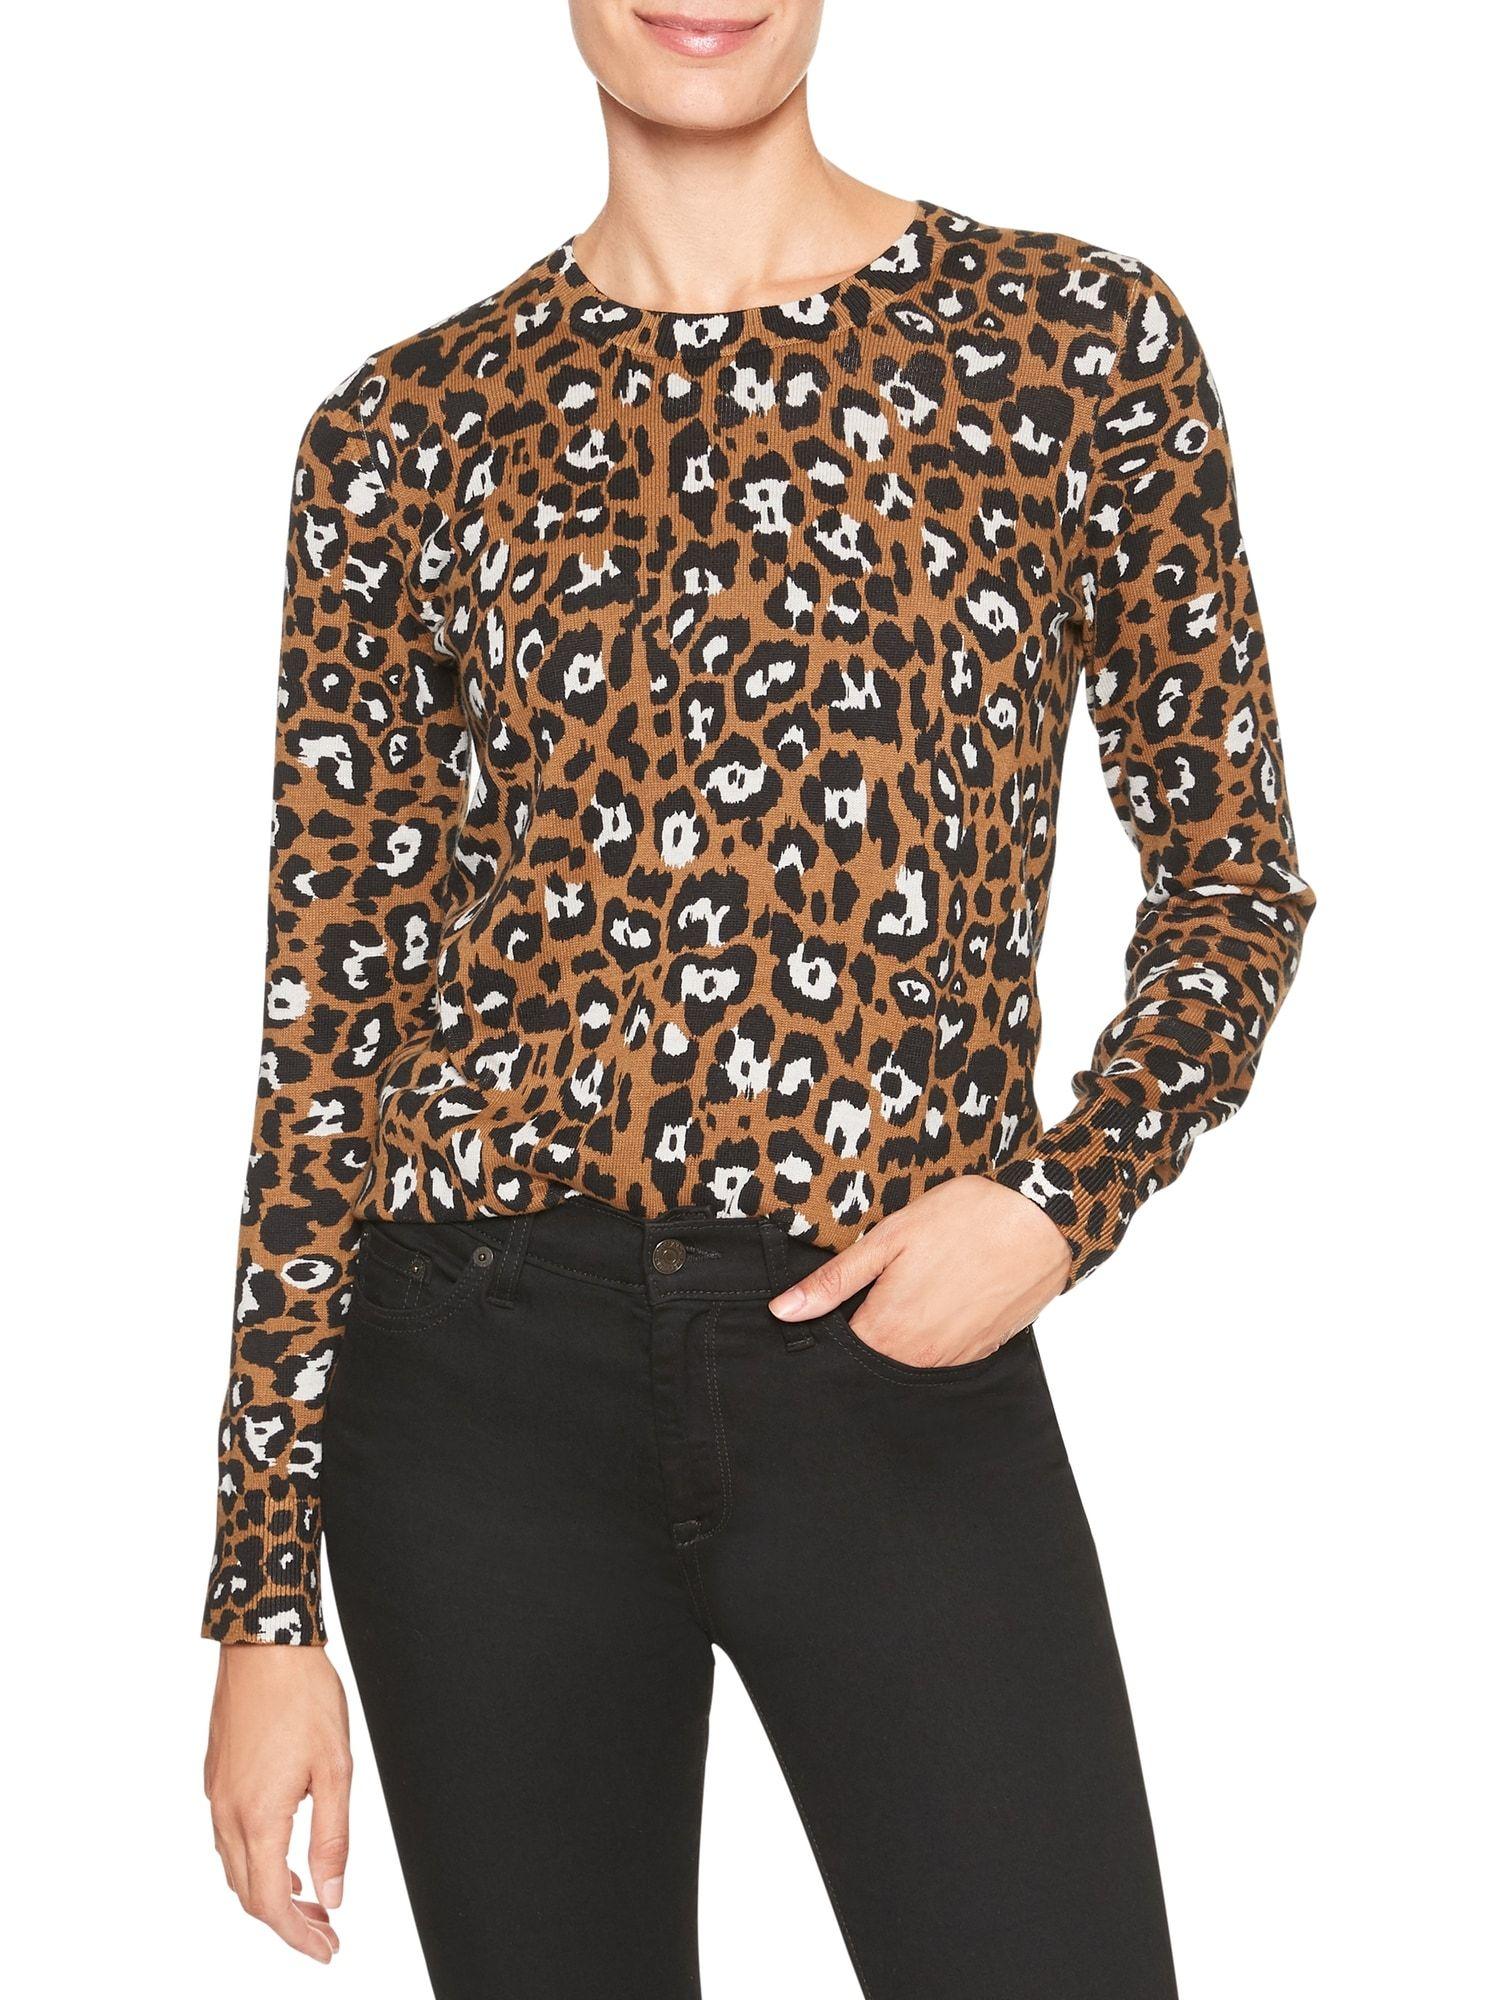 Banana Republic Factory Cheetah Crew Neck Sweater Women